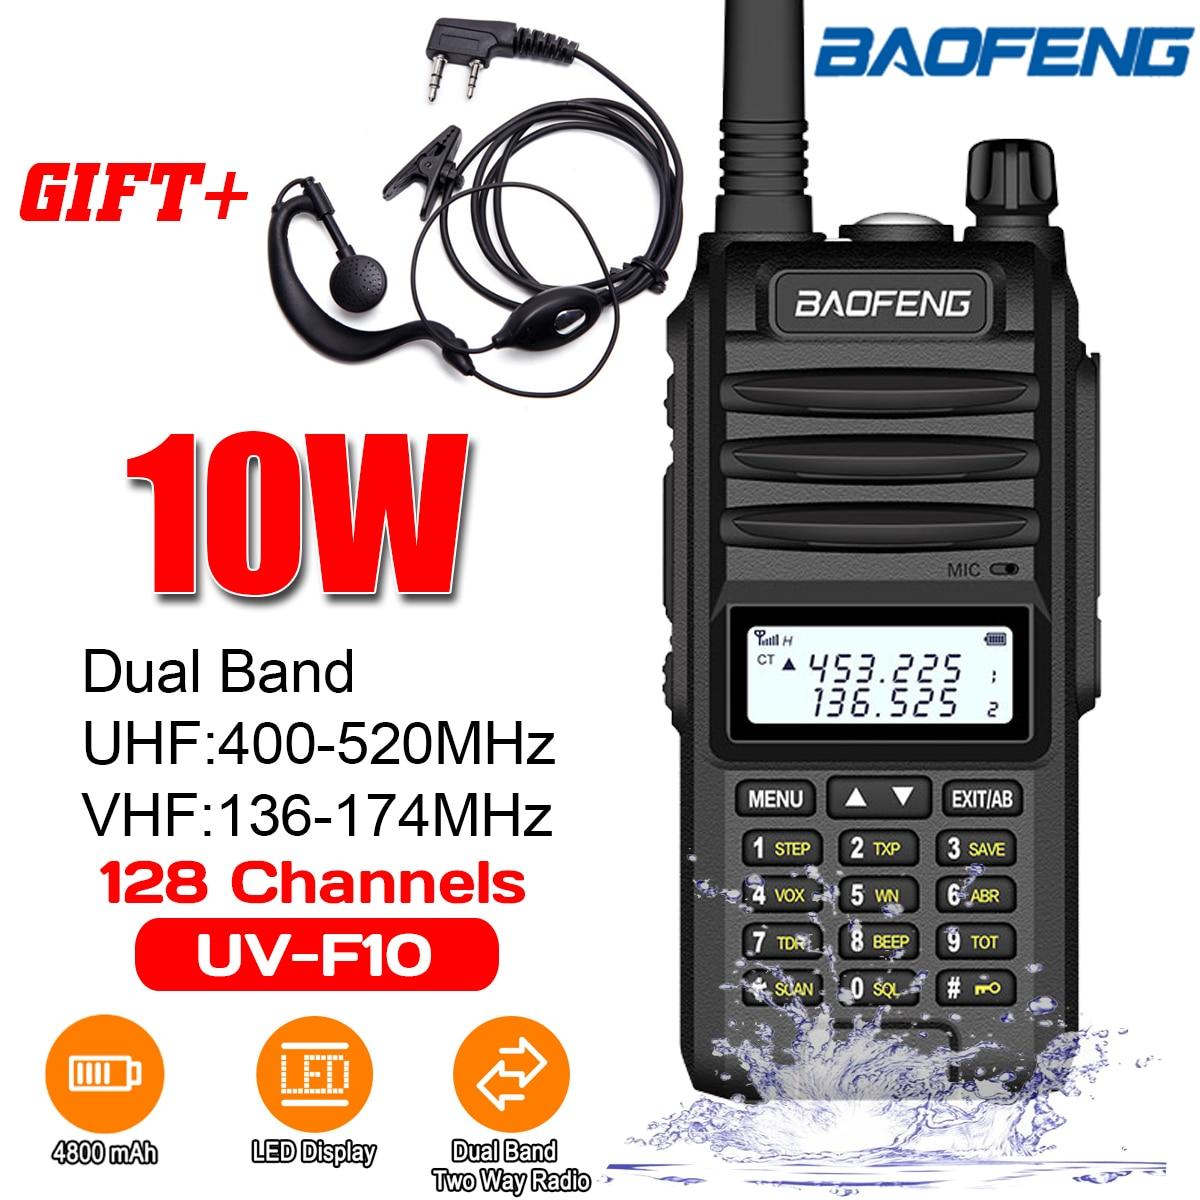 4800mah Baofeng BF-UVF10 Walkie Talkie VHF UHF Dual Band Handheld Two Way Radio VHF UHF Portable Radio 15km Talk-Range